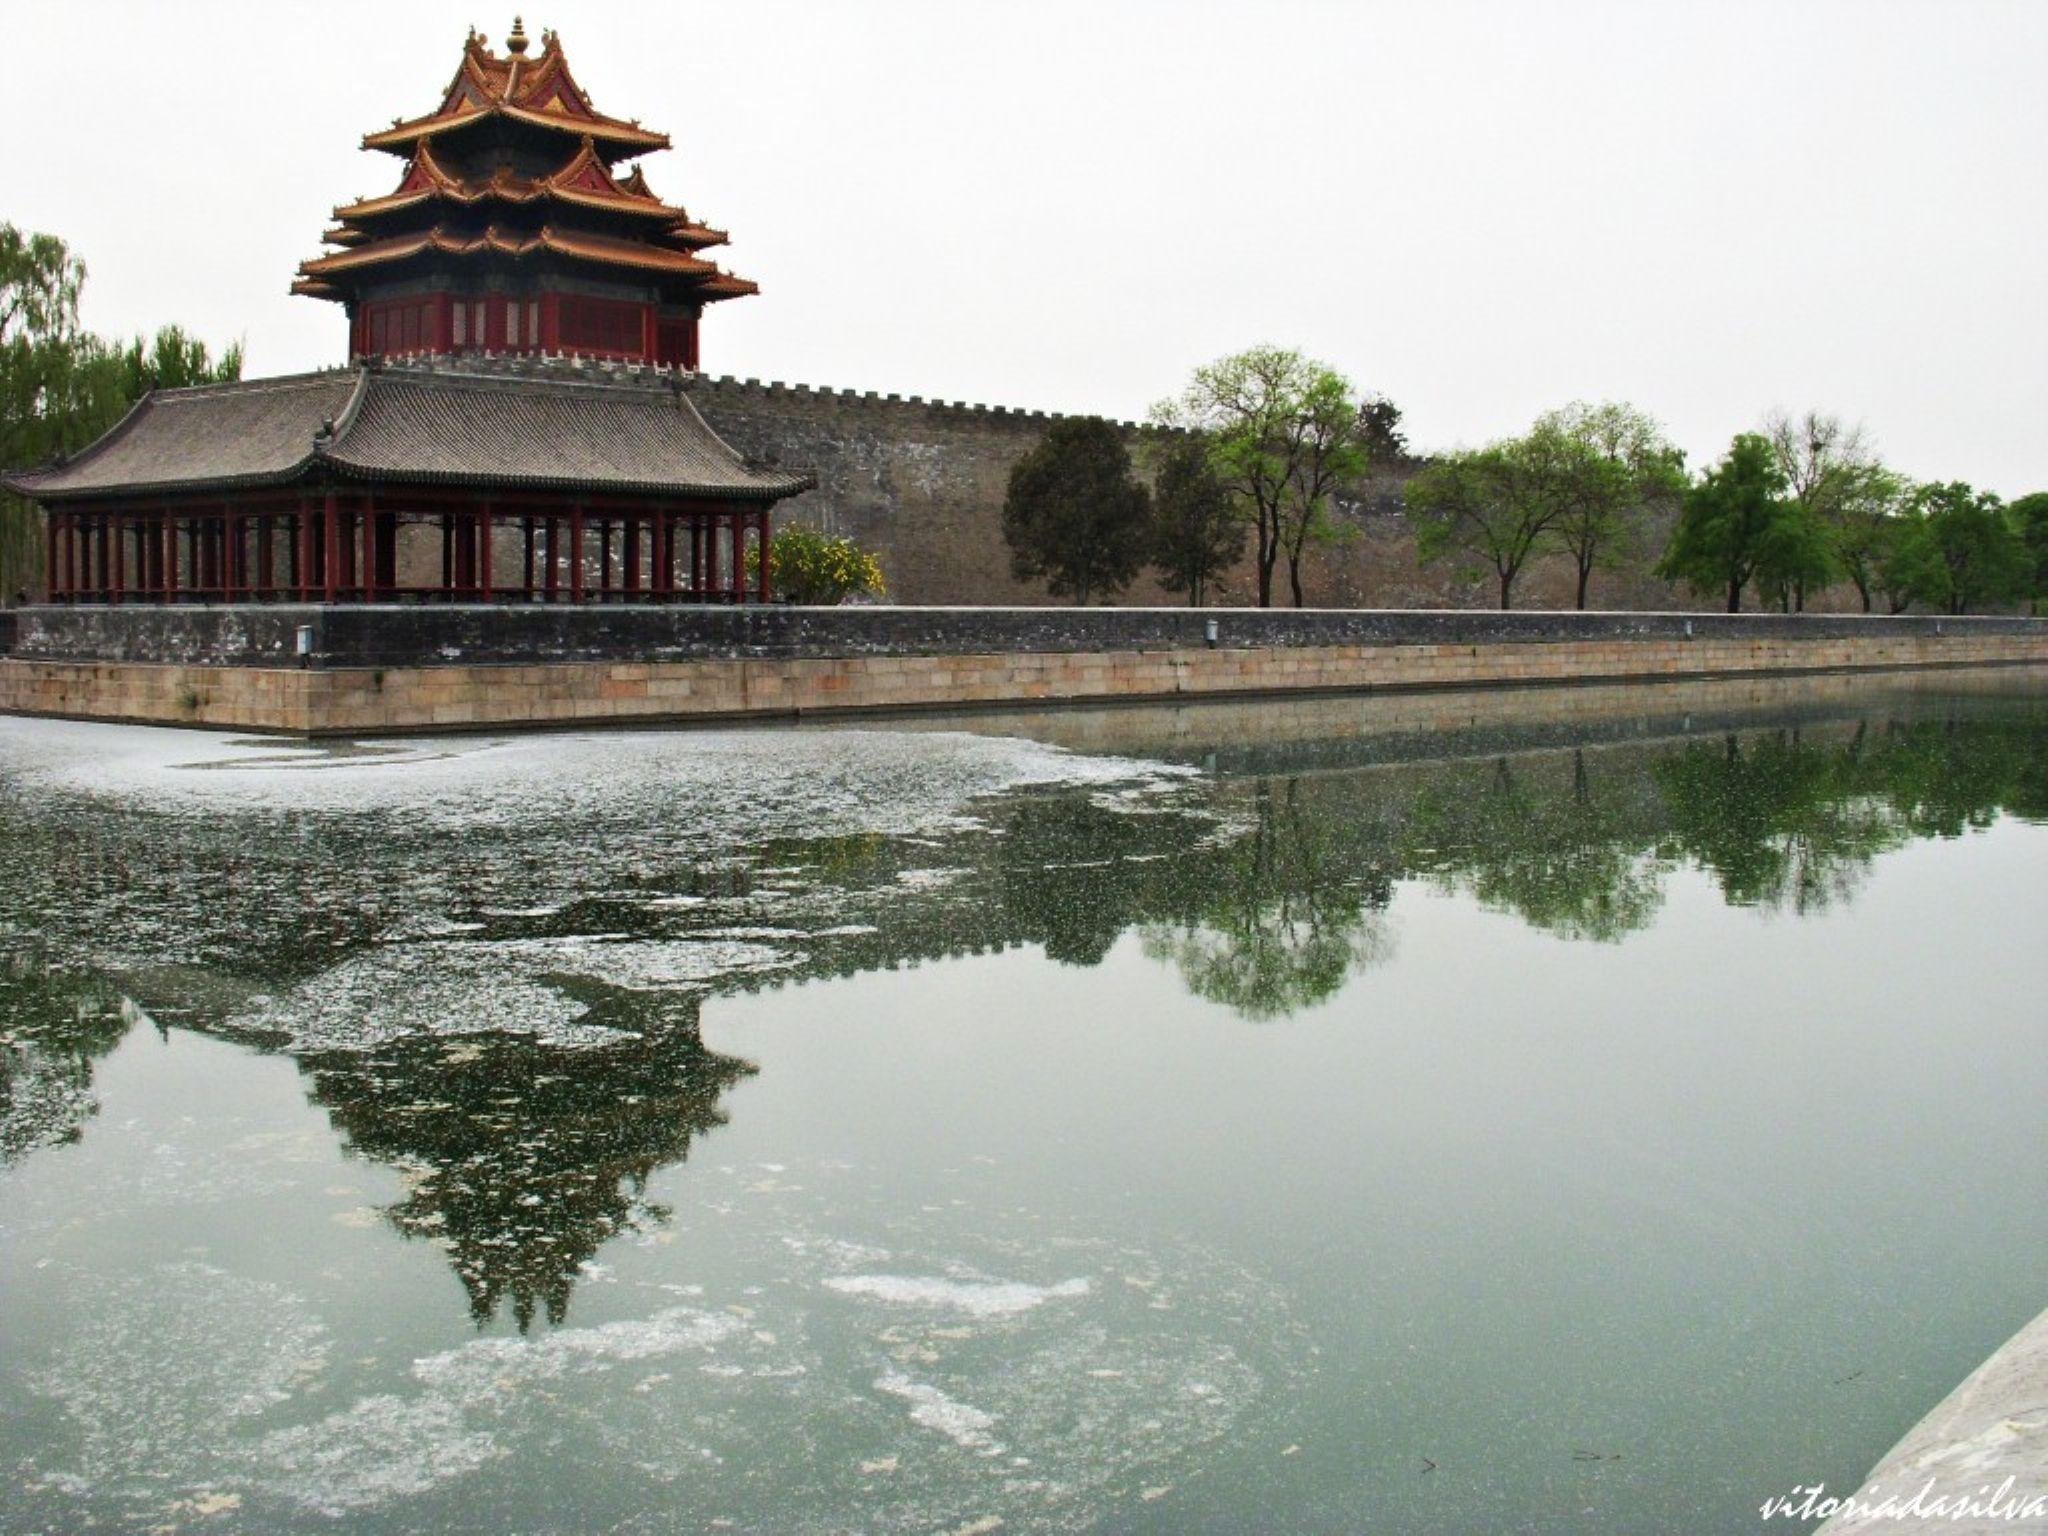 forbidden city by vitoriadasilva